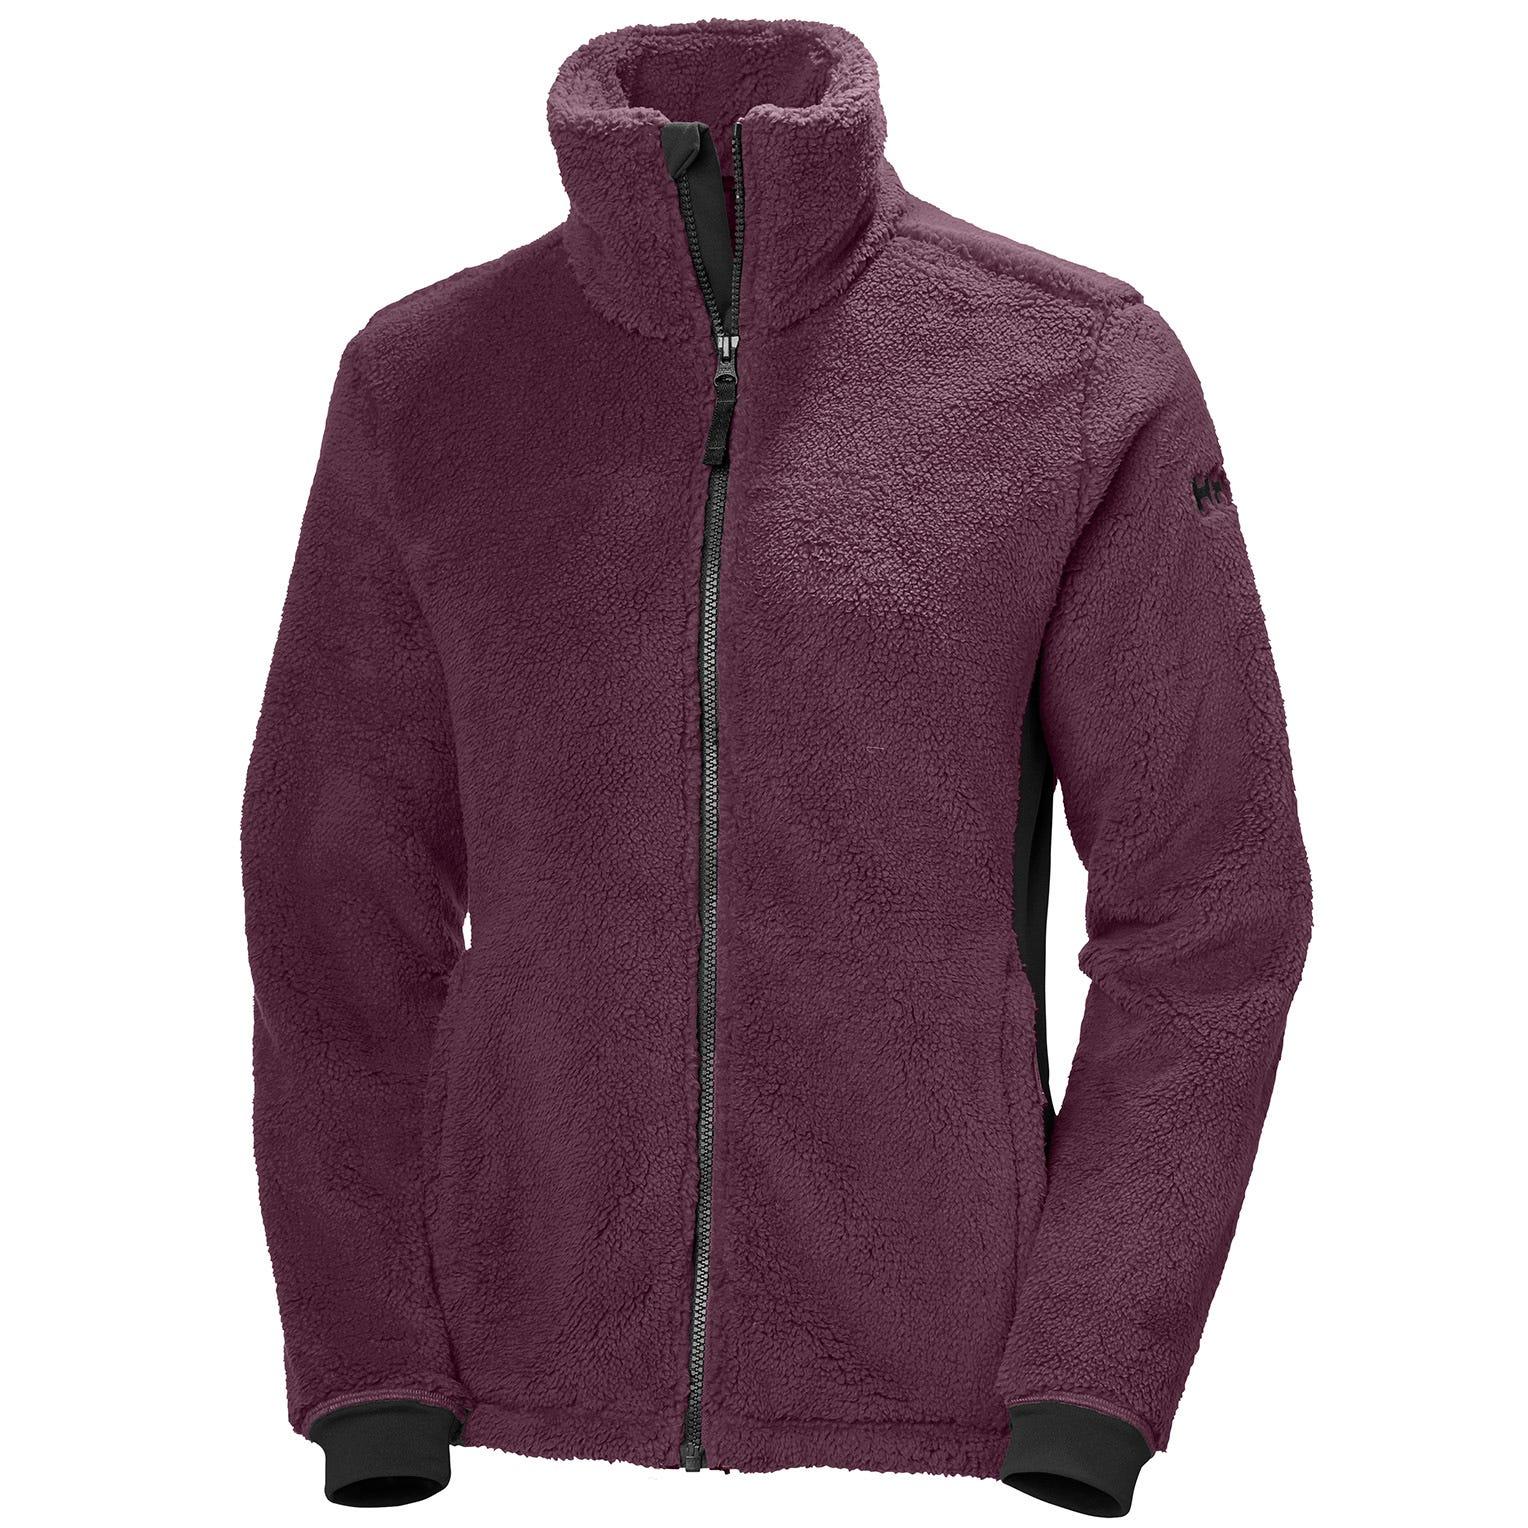 Helly Hansen Womens Precious Fleece Jacket Purple XL